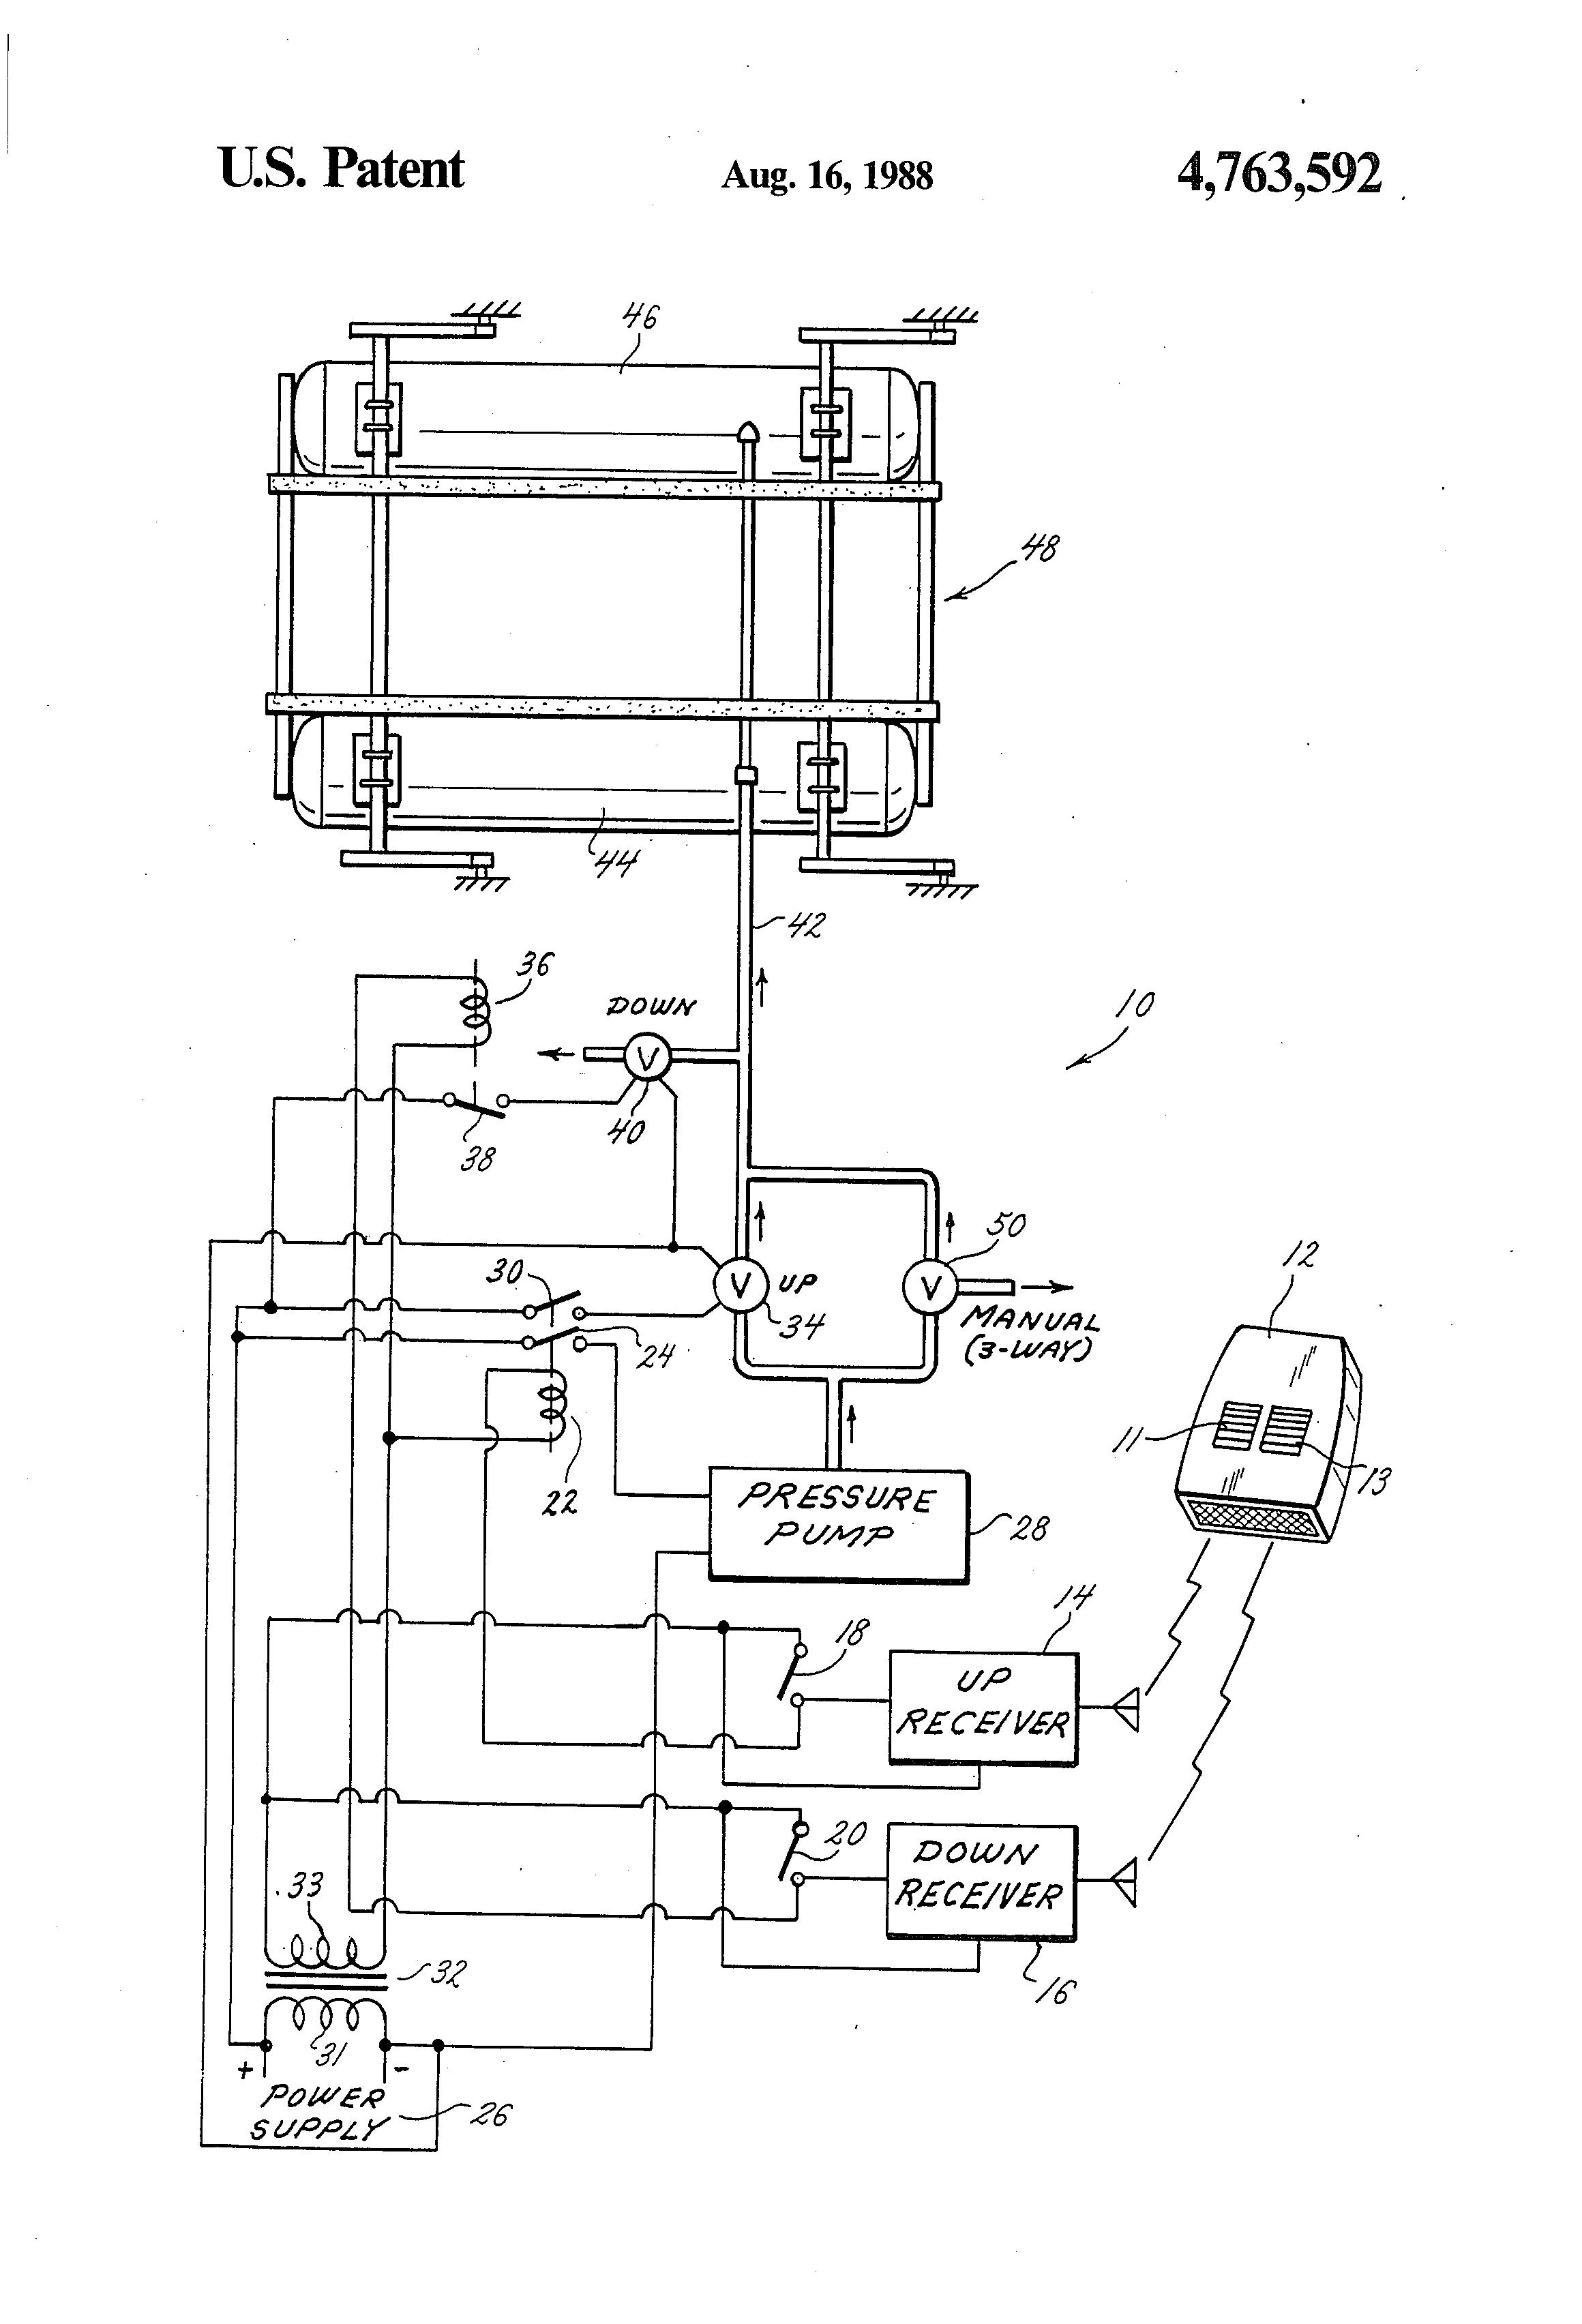 2014 Tec Ii Boat Lift 2 Motor Wiring Diagram